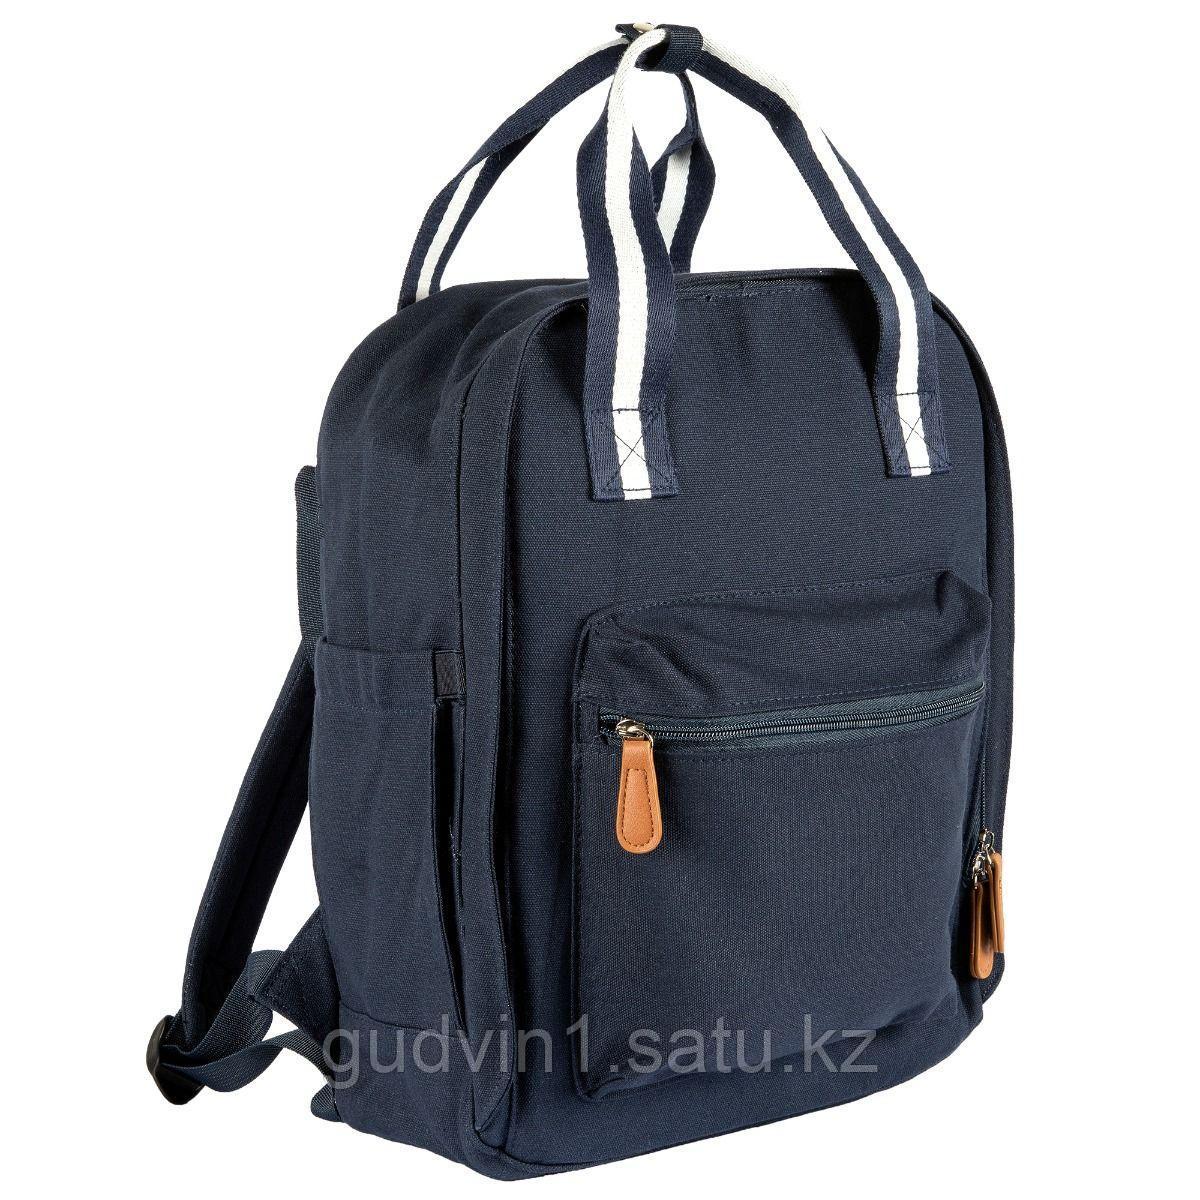 Chicco: Сумка-рюкзак для мамы синий  1160009